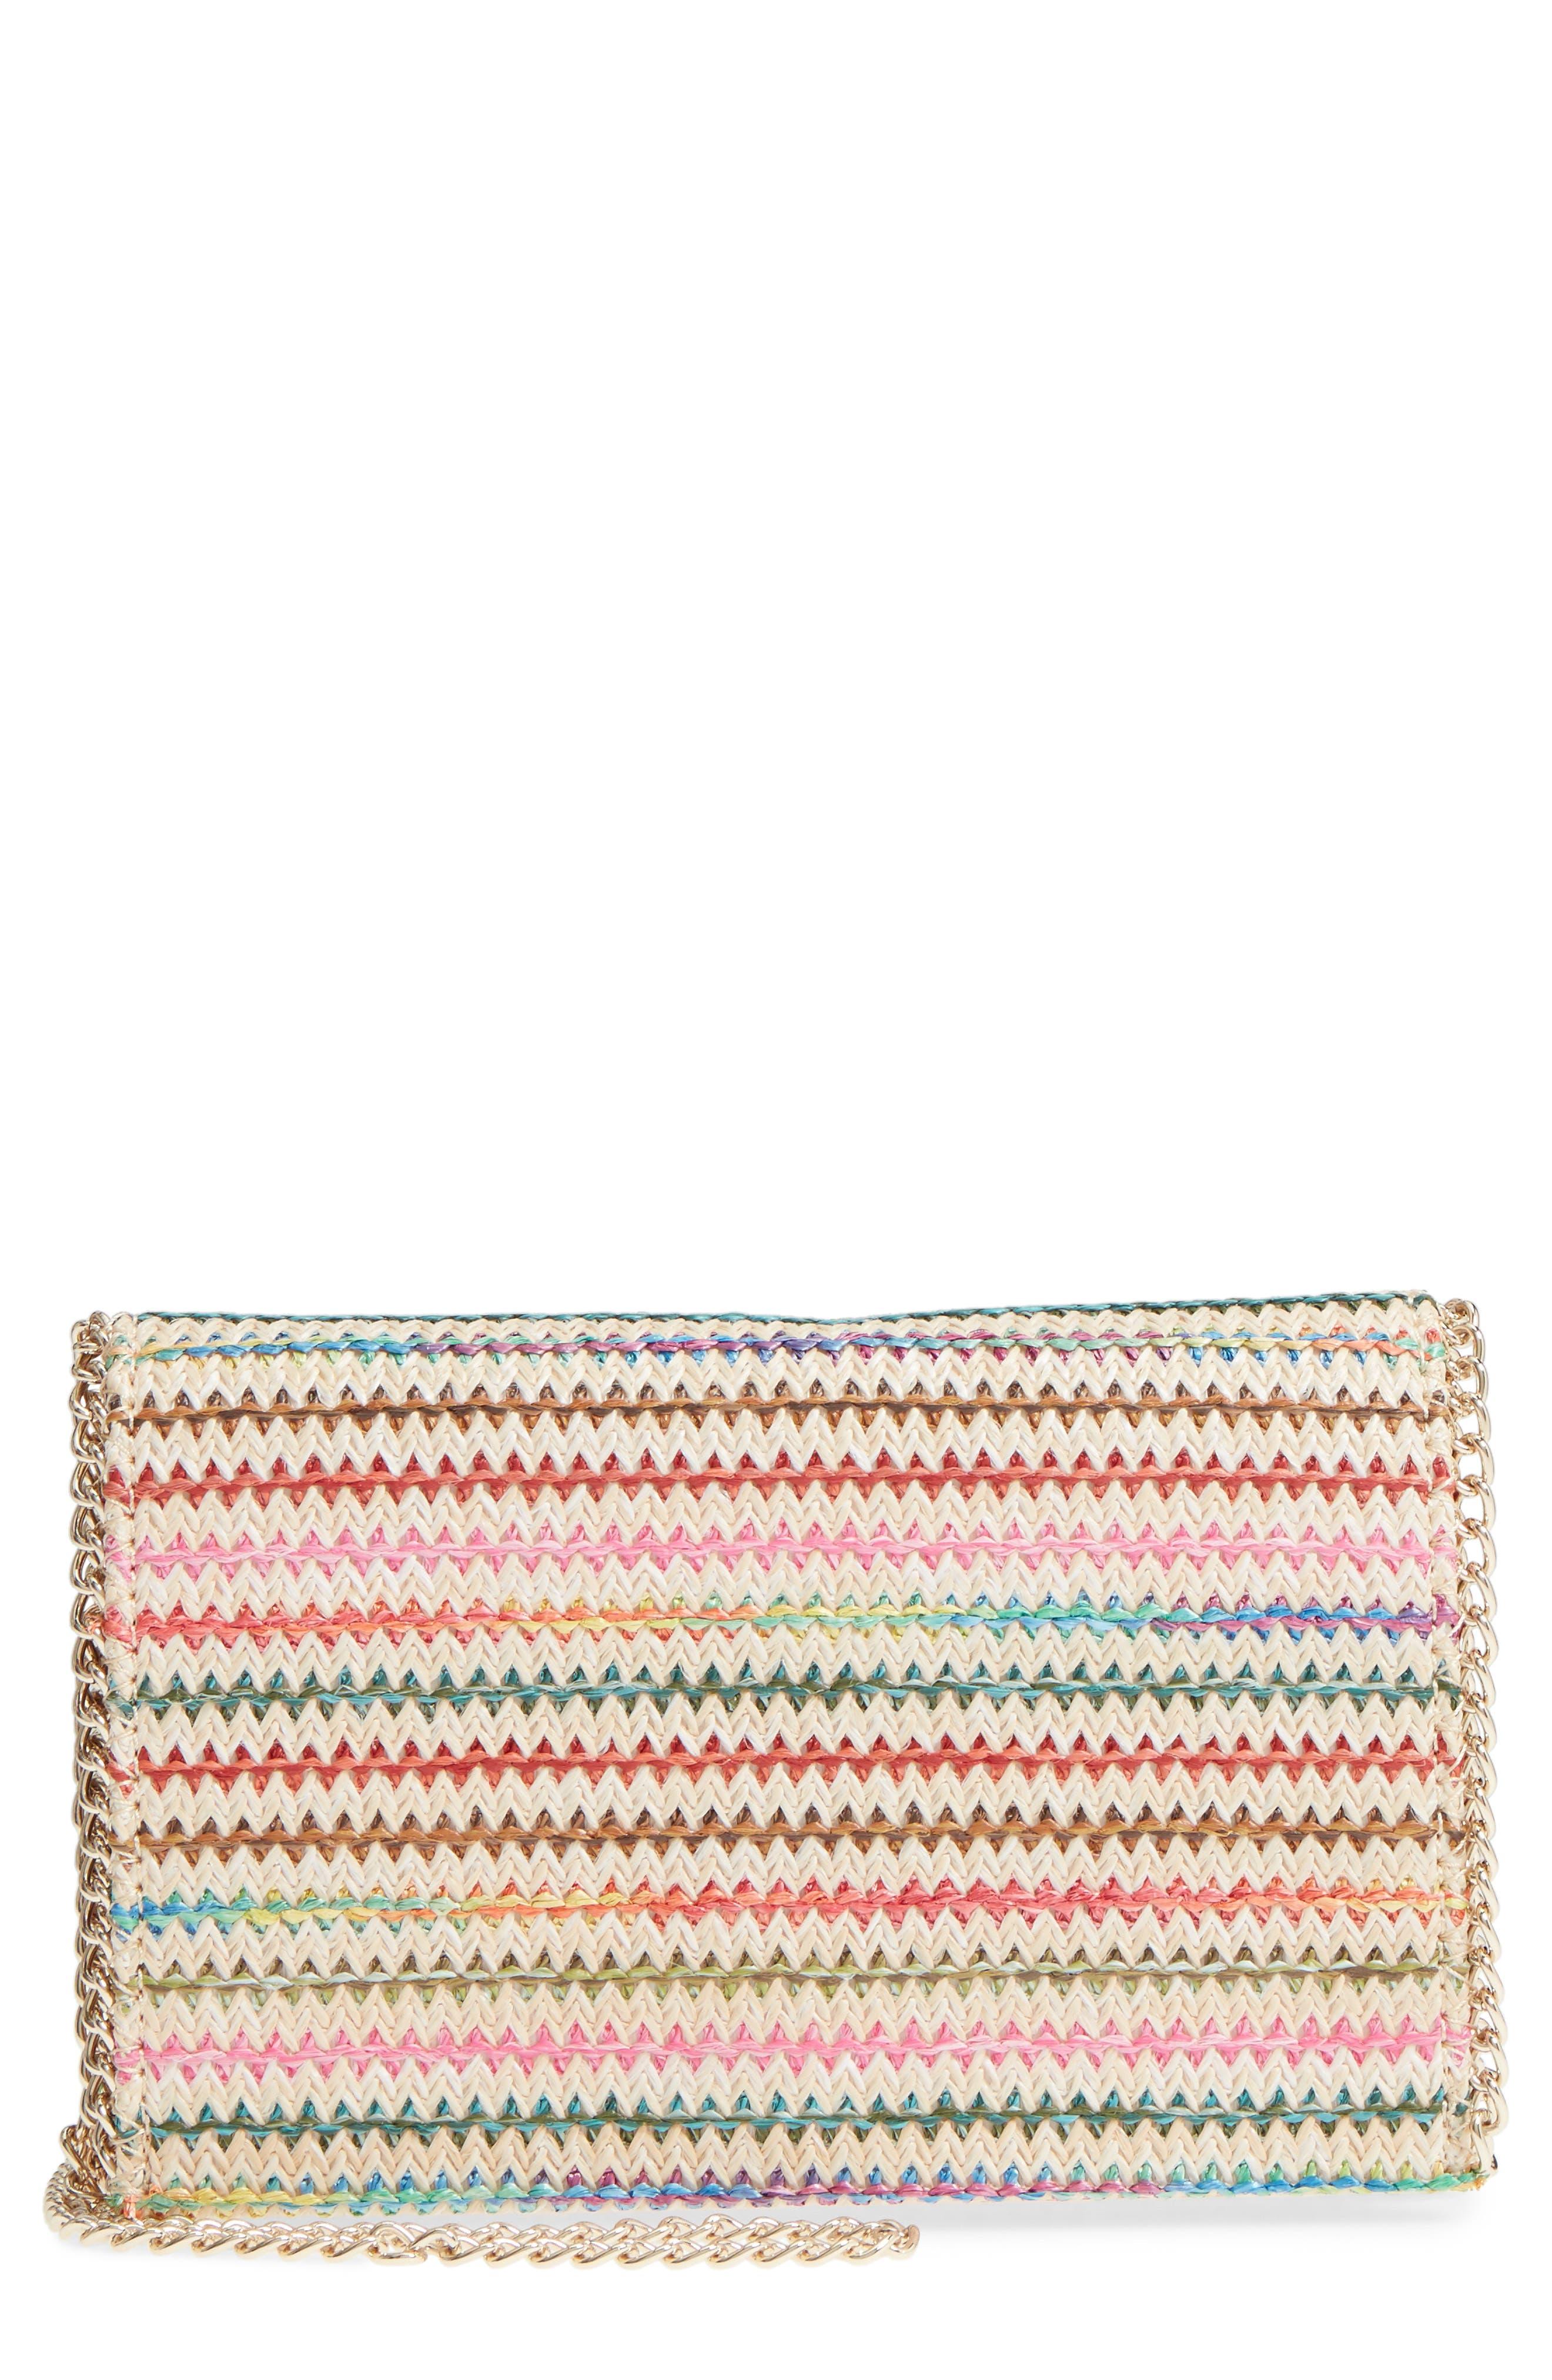 Multistripe Woven Clutch,                             Main thumbnail 1, color,                             Natural Multicolor Stripe